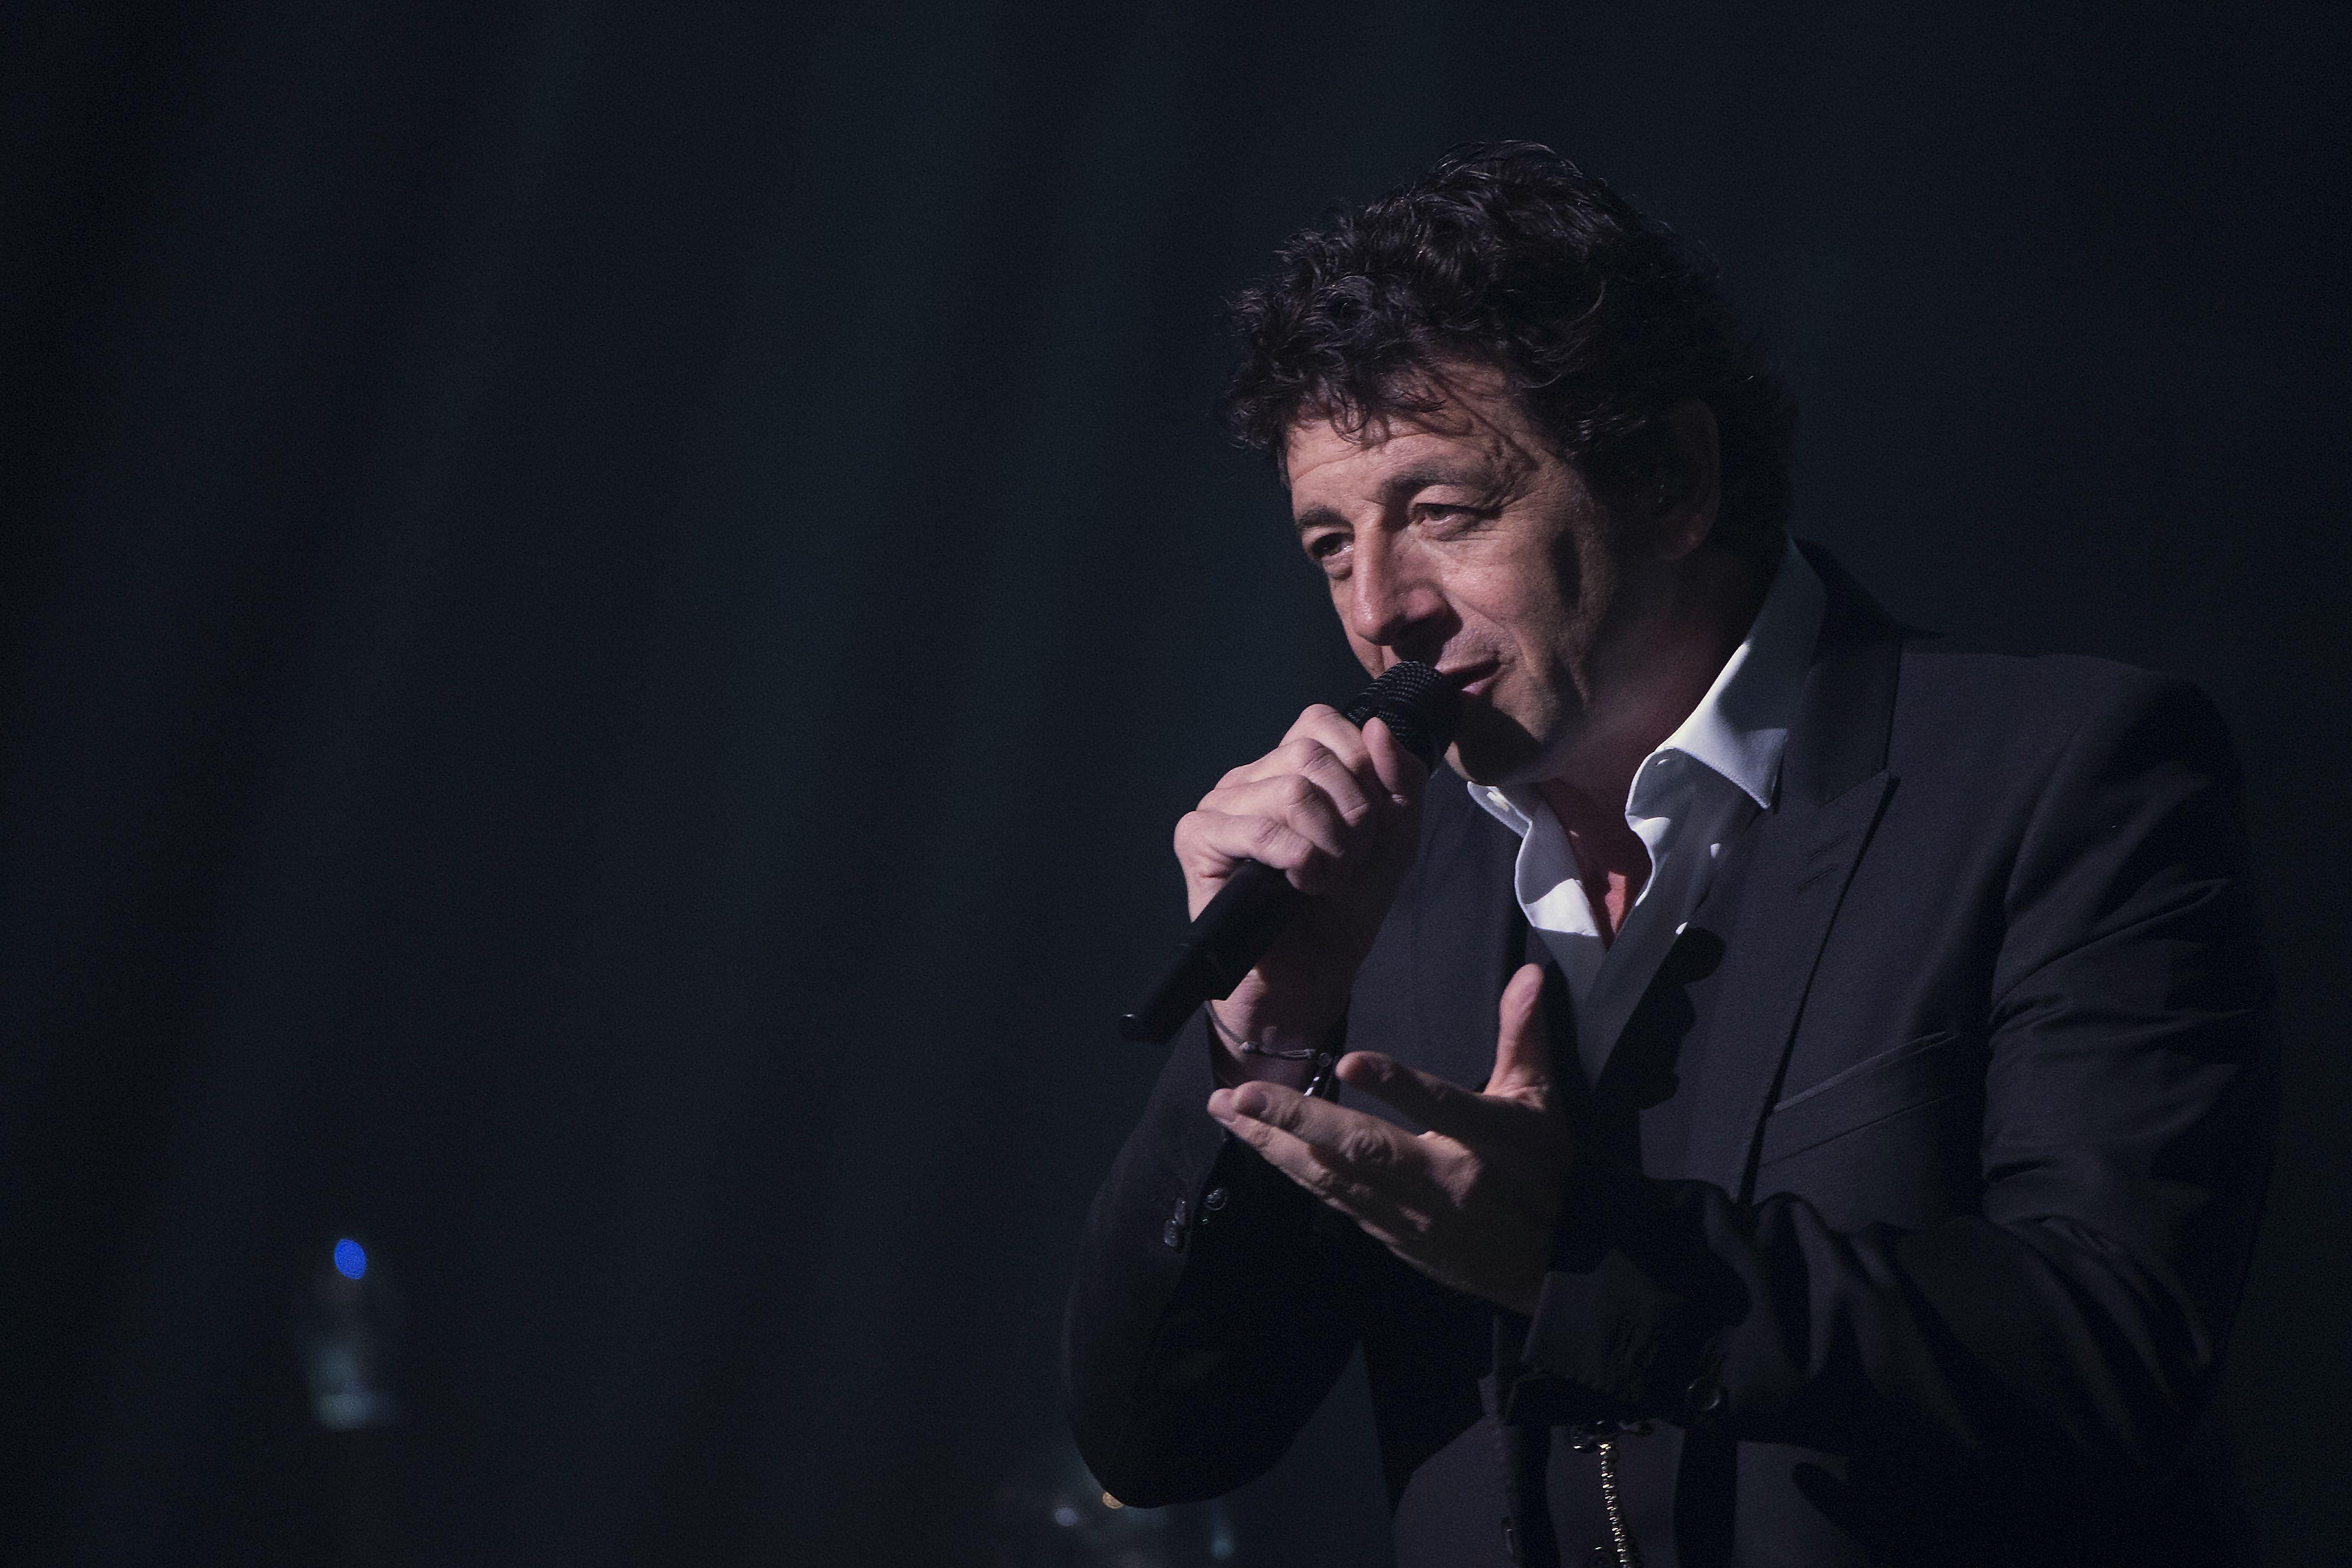 Patrick Bruel rend un vibrant hommage à Barbara au Théâtre